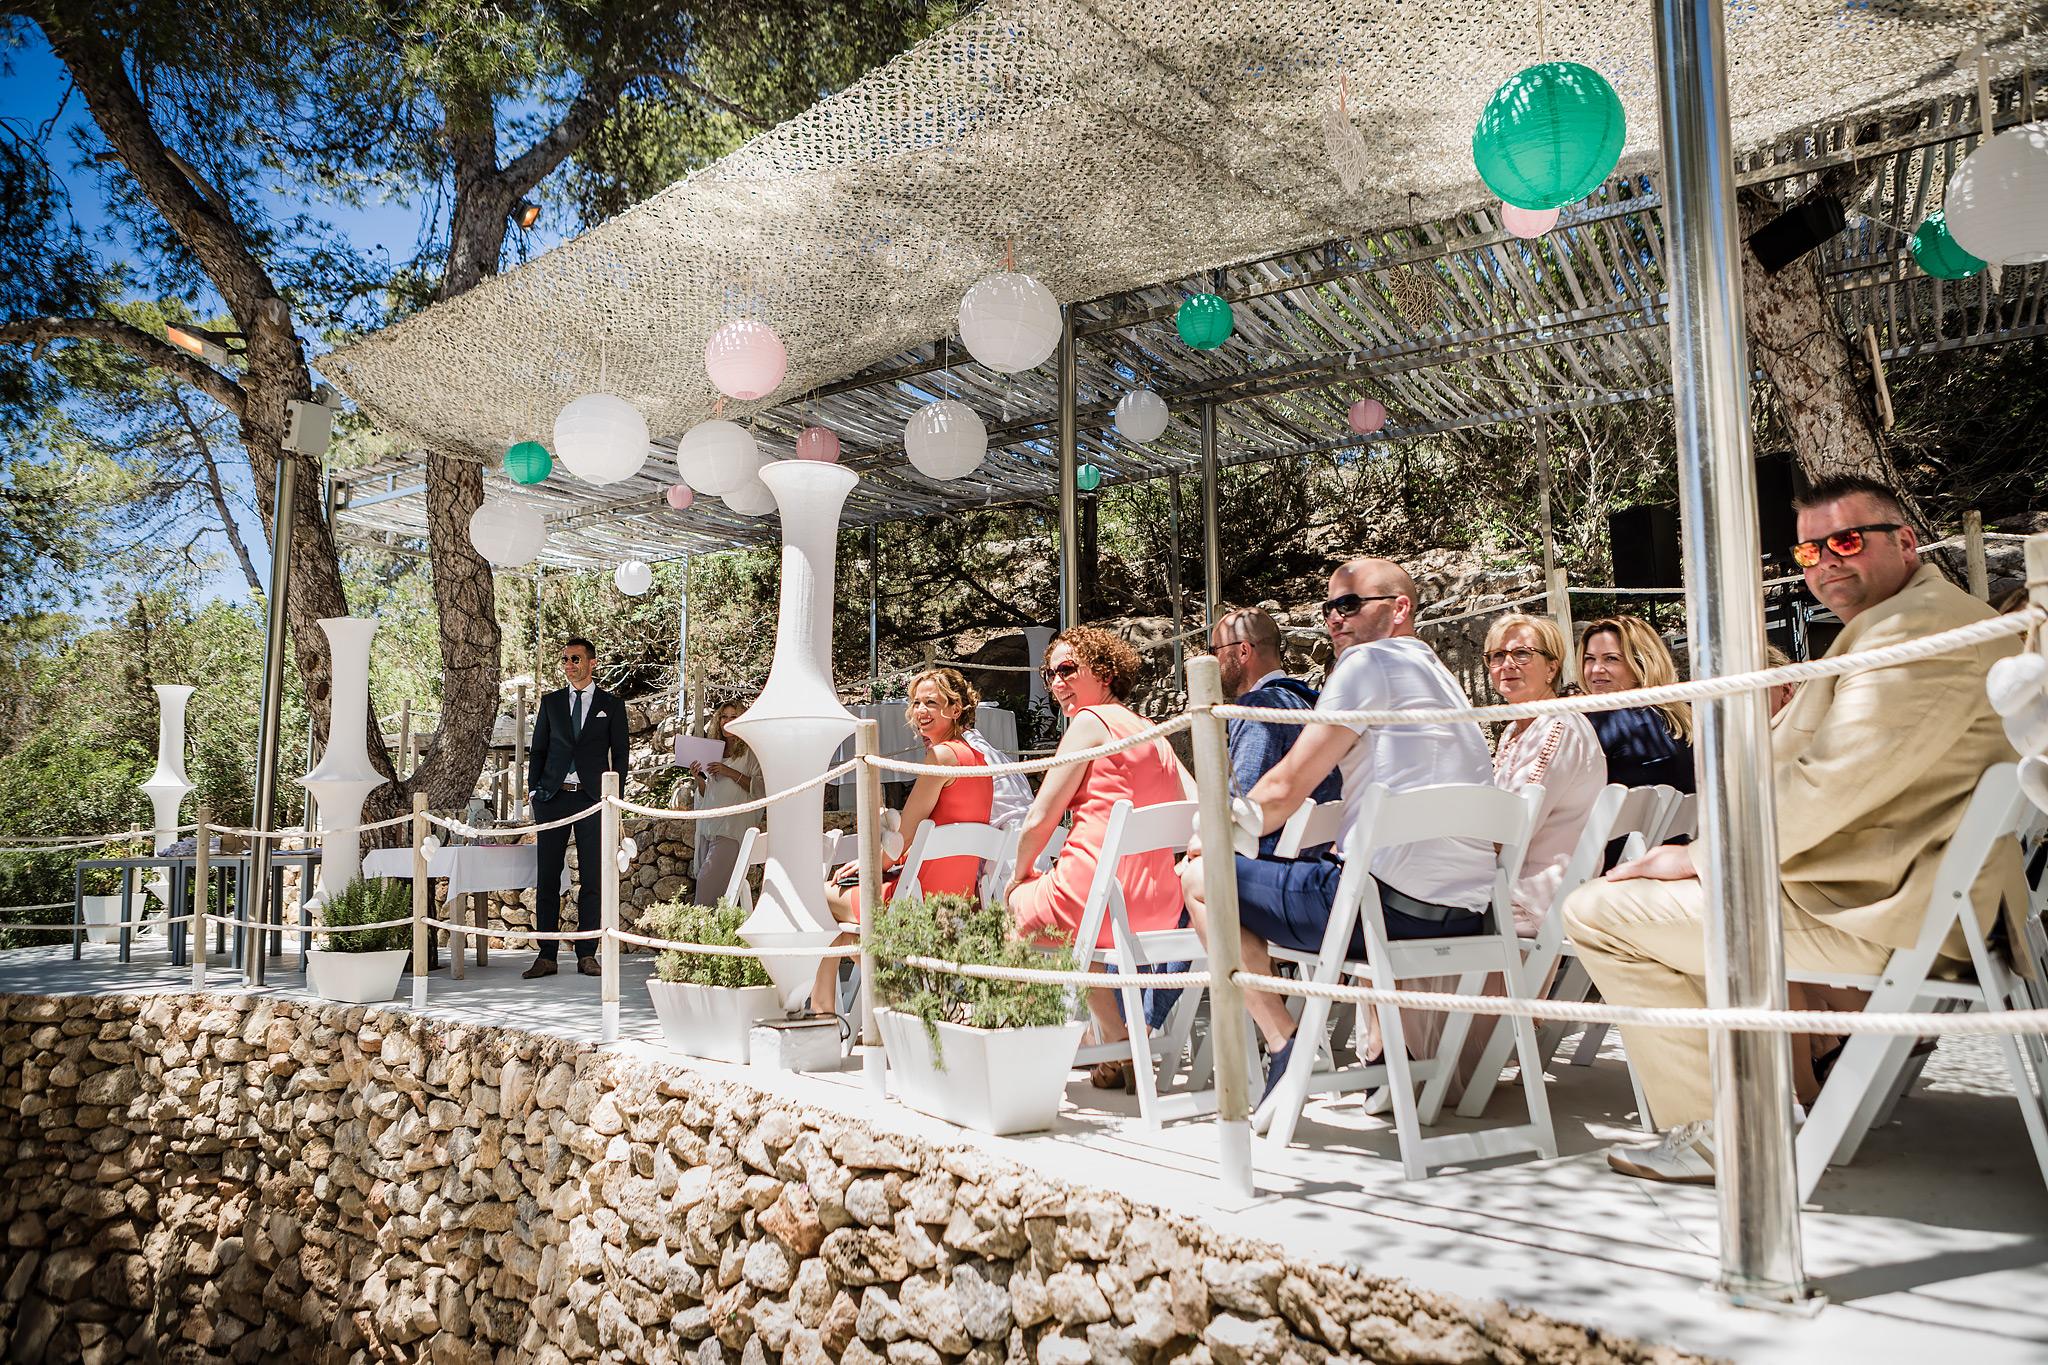 Bruidsreportage Destination Wedding Ibiza Mandy en Joost 012 - Bas Driessen Fotografie